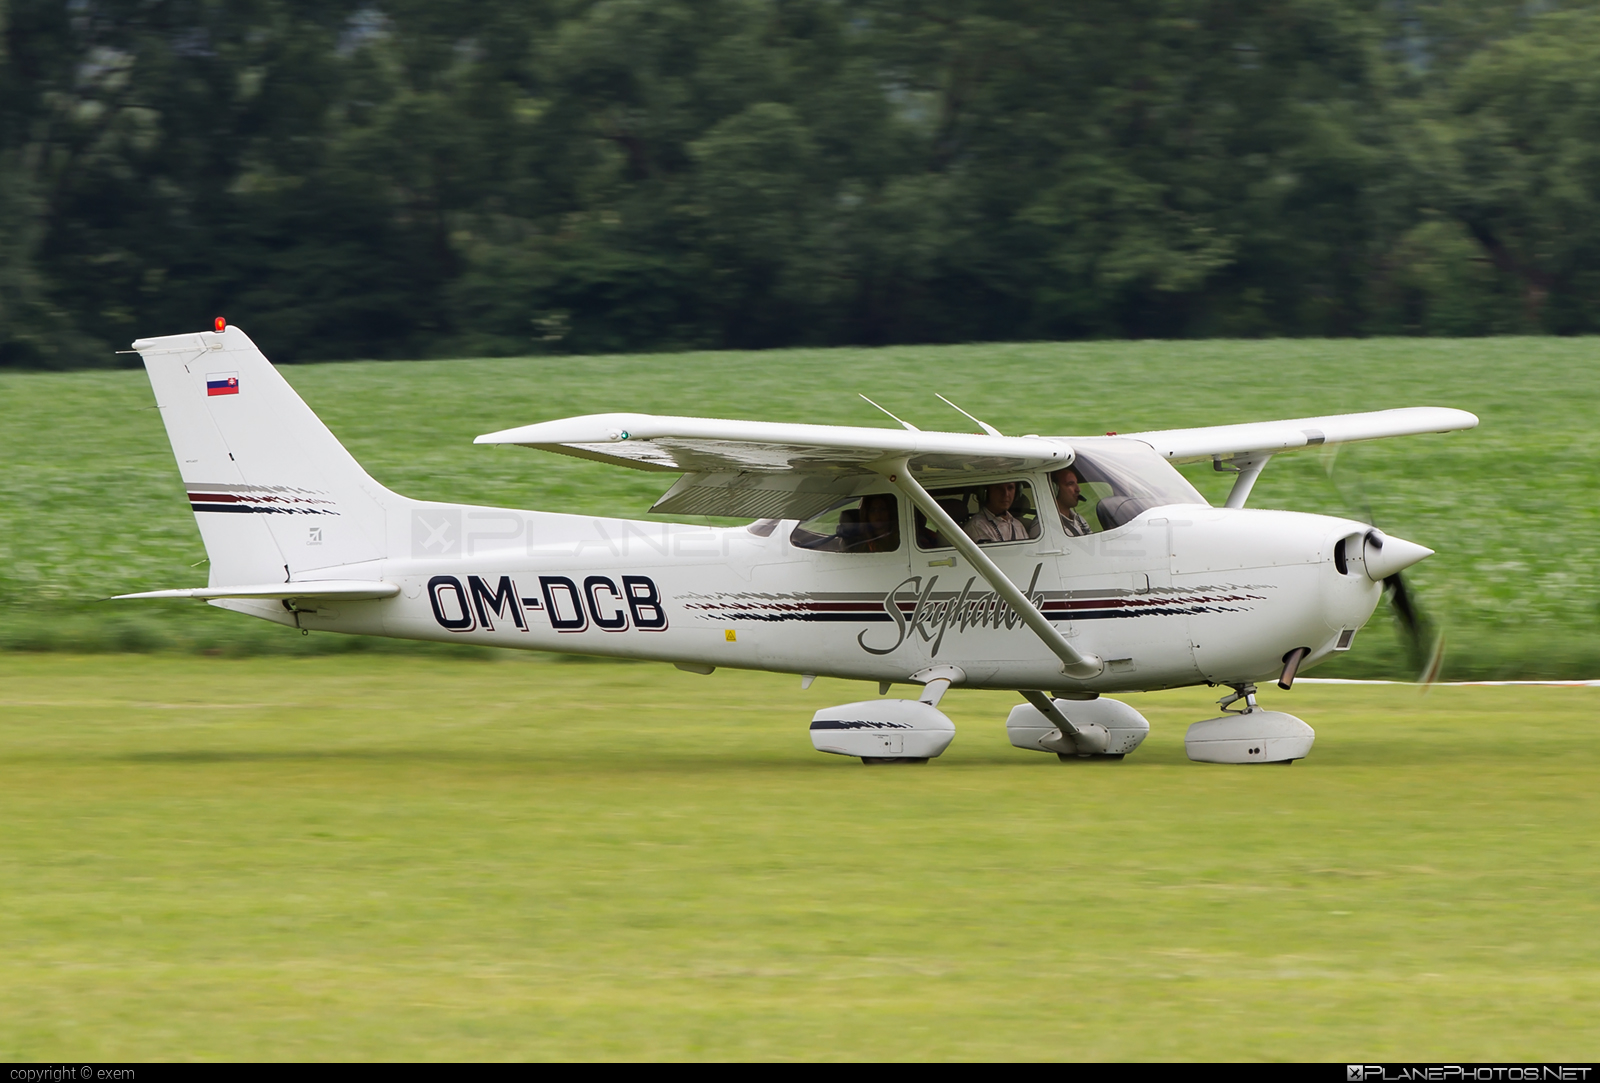 Cessna 172R Skyhawk II - OM-DCB operated by Aeroklub Dubnica nad Váhom #cessna #cessna172 #cessna172r #cessna172rskyhawk #cessna172skyhawk #cessnaskyhawk #skyhawkii